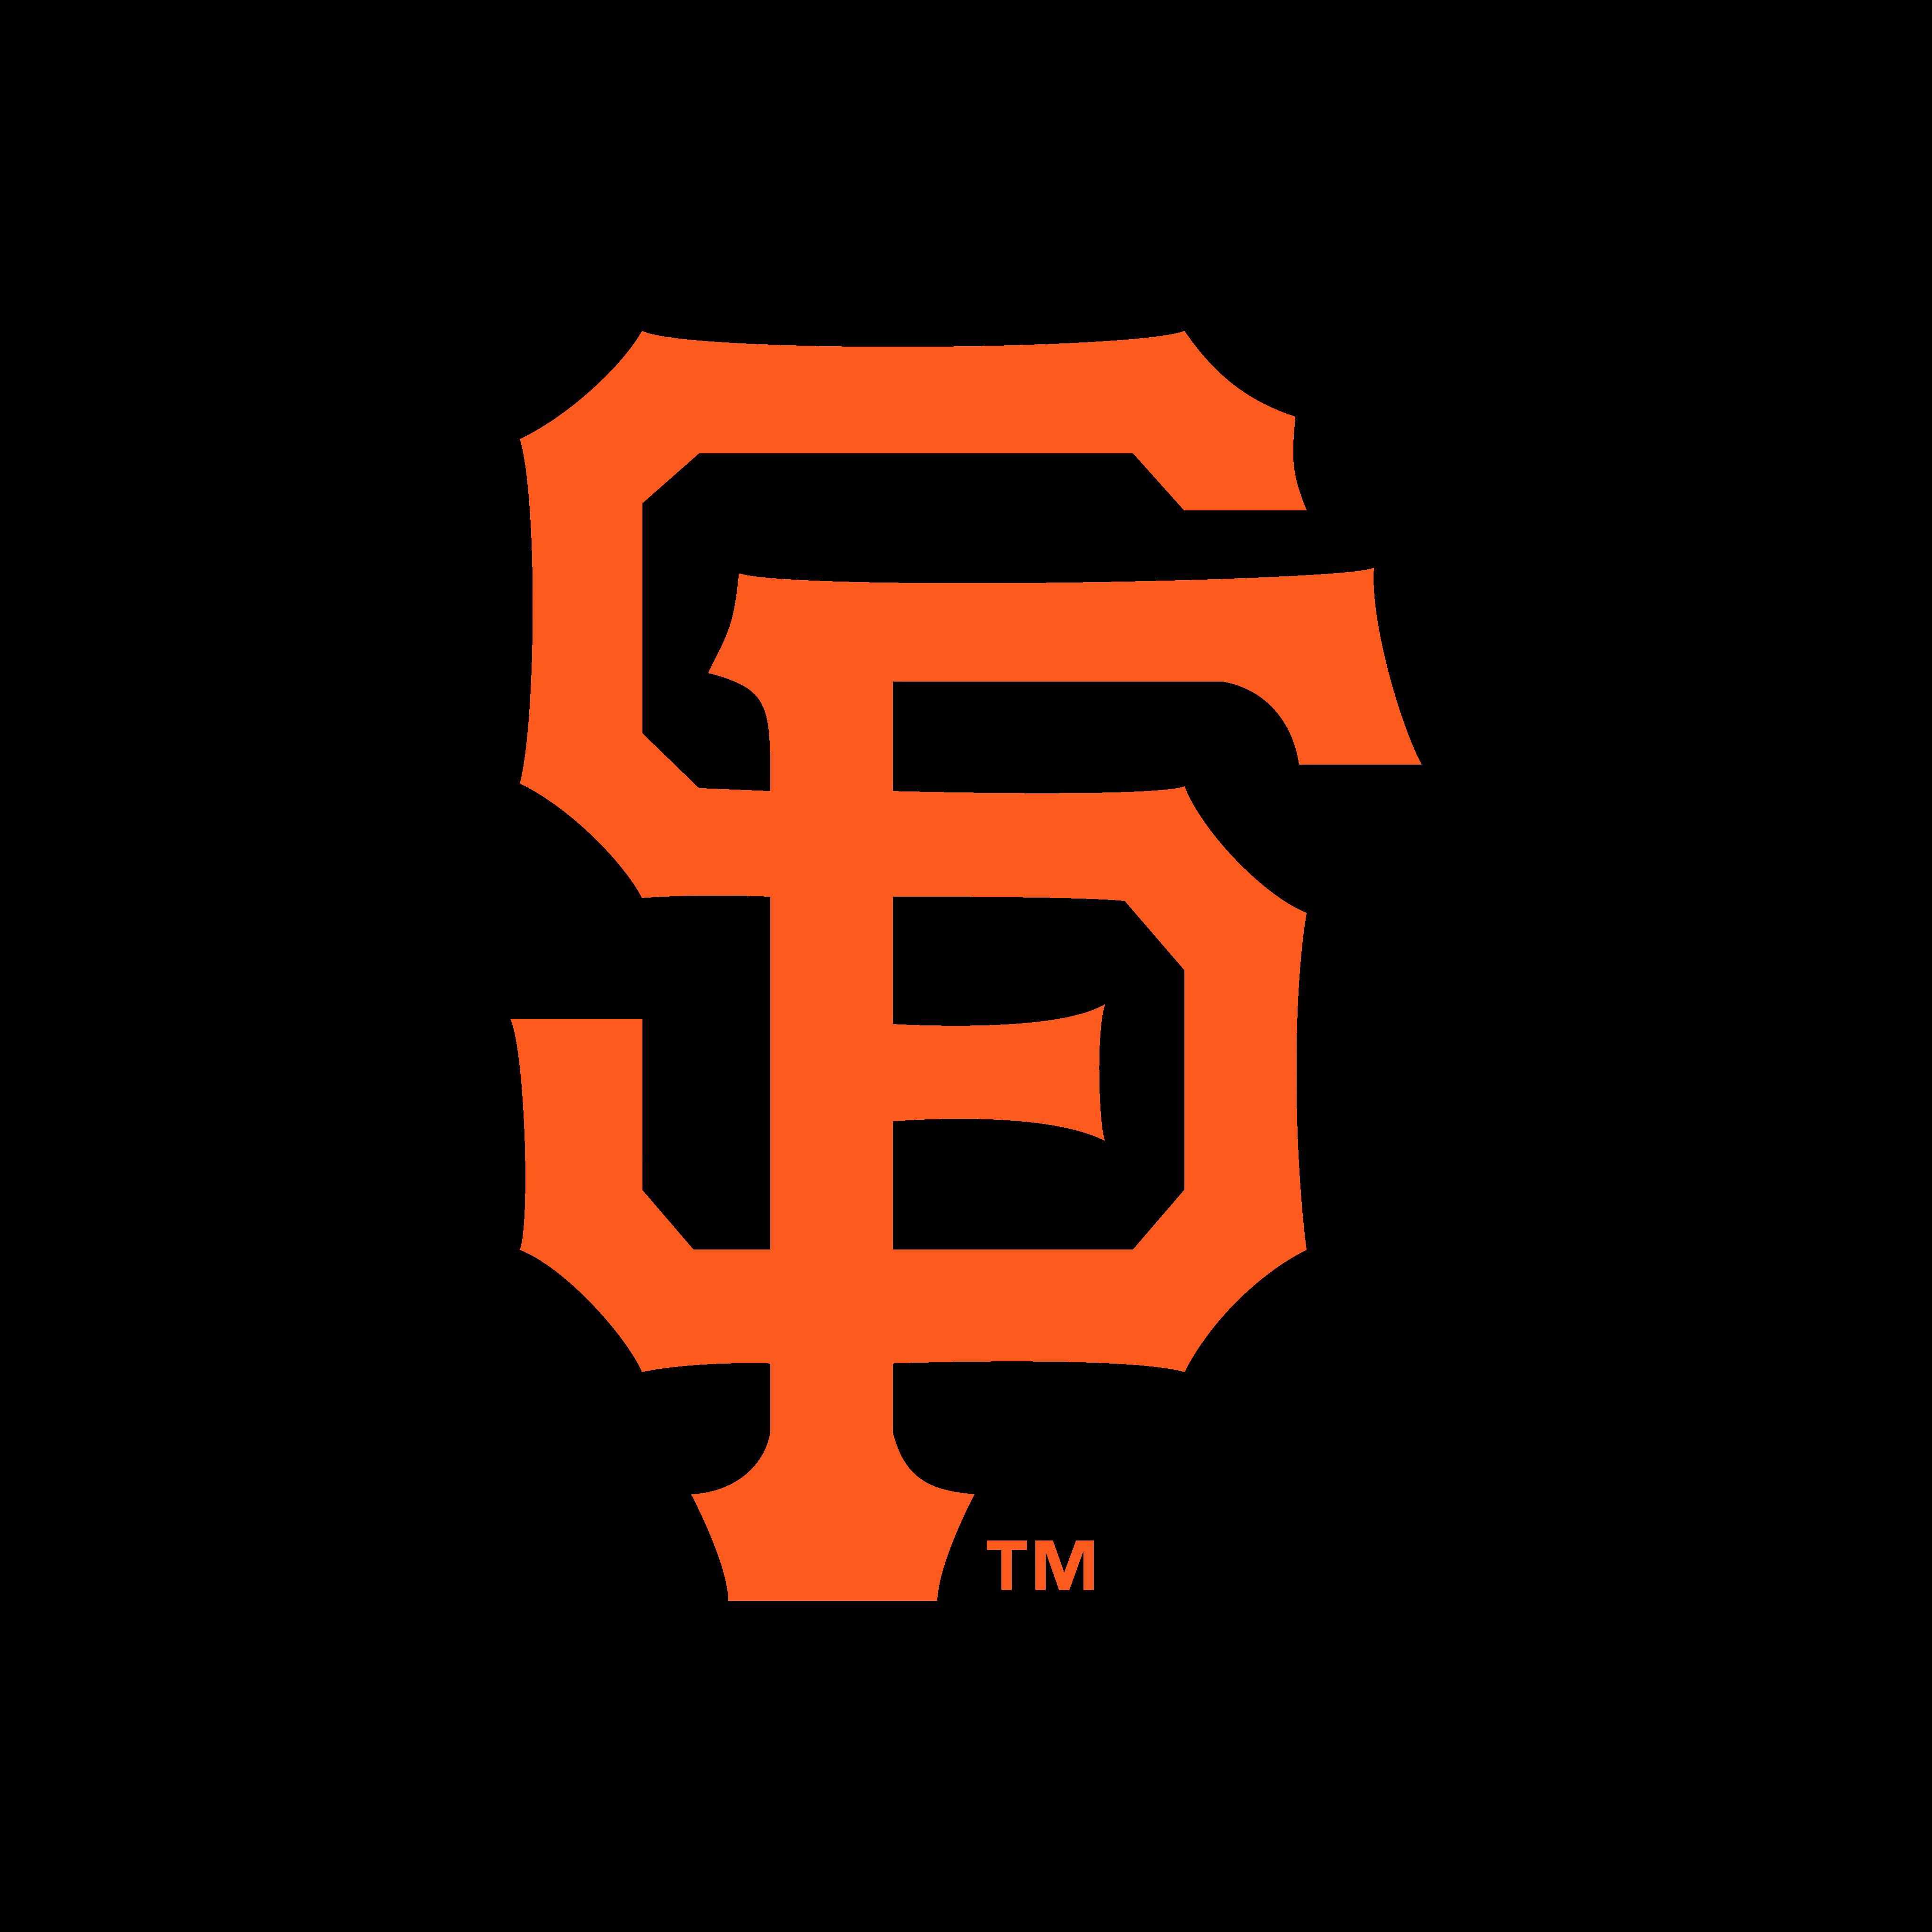 san francisco giants logo 0 - San Francisco Giants Logo